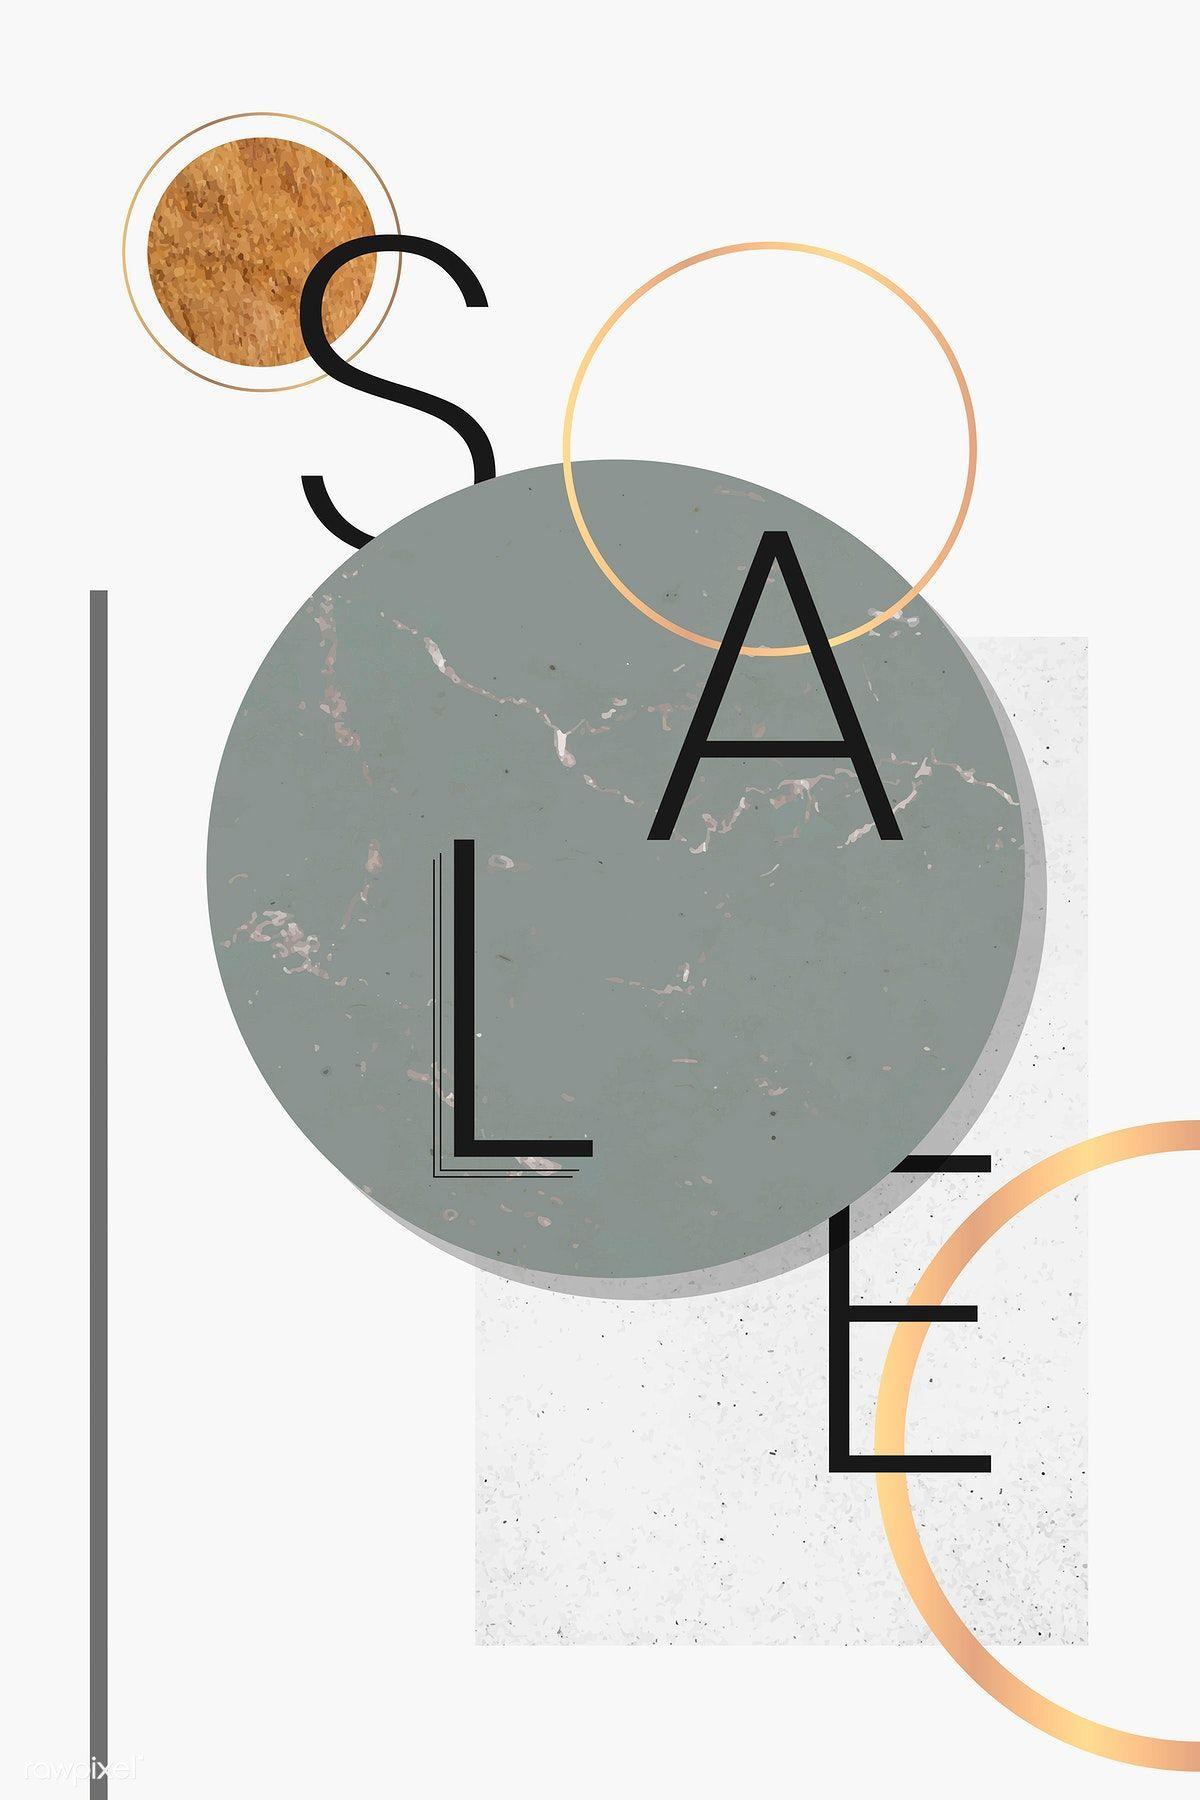 sale wallpaper Round green marble frame vector | premium image by rawpixel.com / sasi #vector #vectoart #digitalpainting #digitalartist #garphicdesign #sketch #digitaldrawing #doodle #illustrator #digitalillustration #modernart